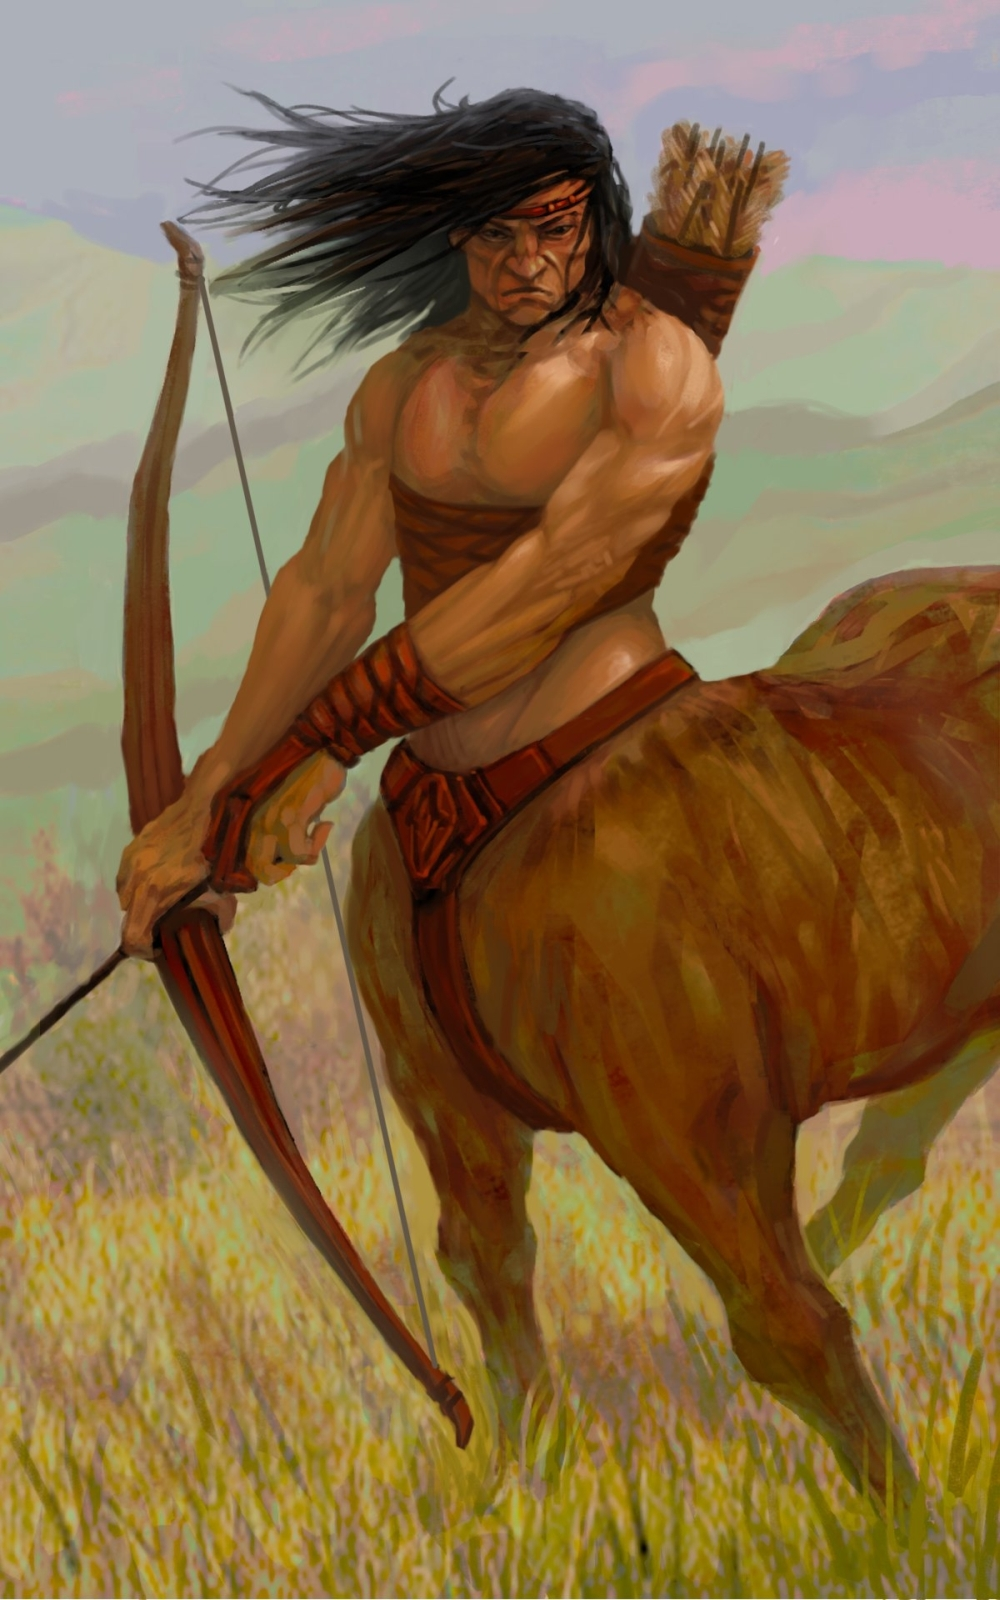 Hot centaur sexy images